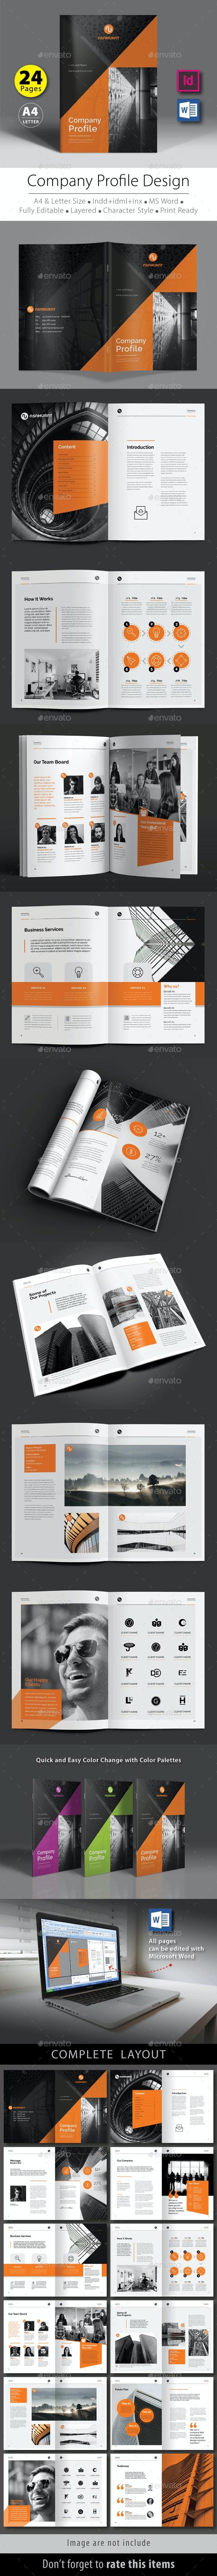 Marlakk Compro V.5 - Corporate Brochures